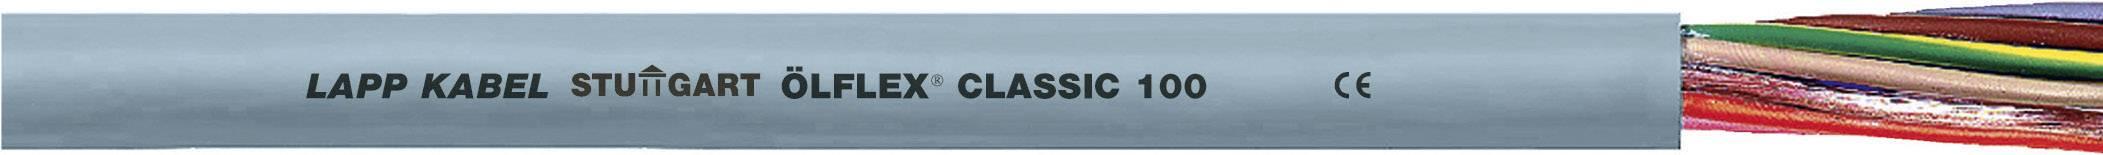 Kabel LappKabel Ölflex CLASSIC 100 4G25 (00101153), PVC, 25,4 mm, 750 V, šedá, 50 m